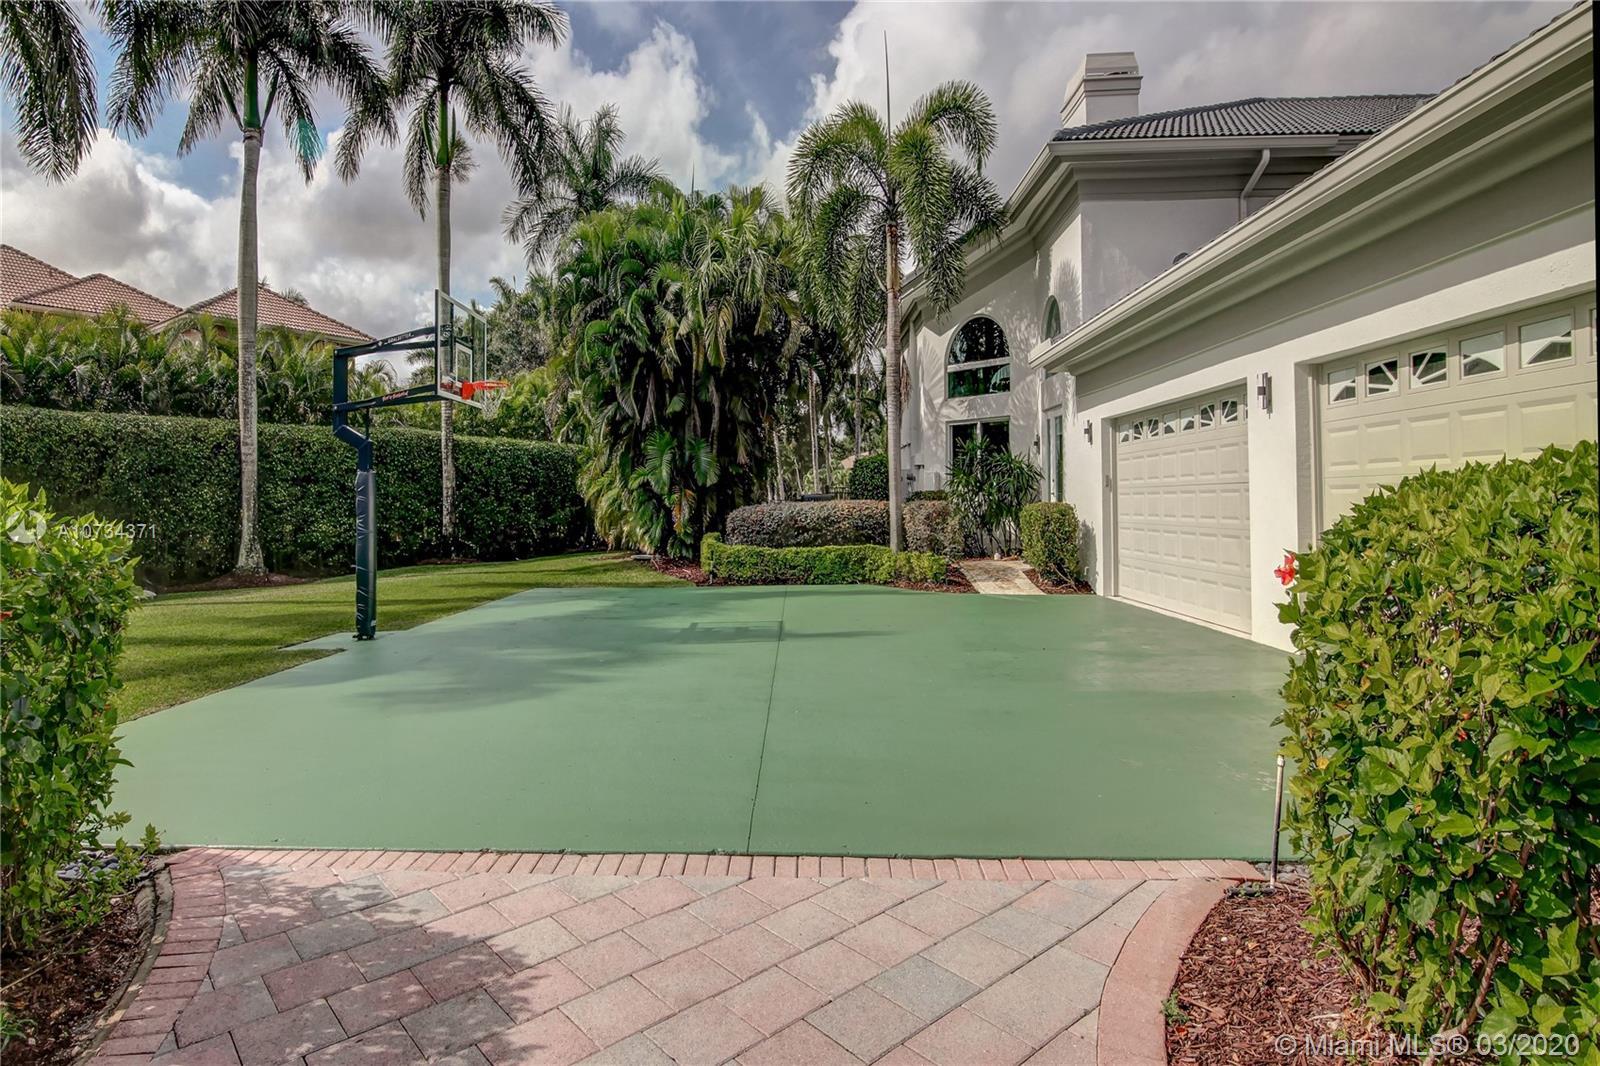 Homes for Sale in Zip Code 33331